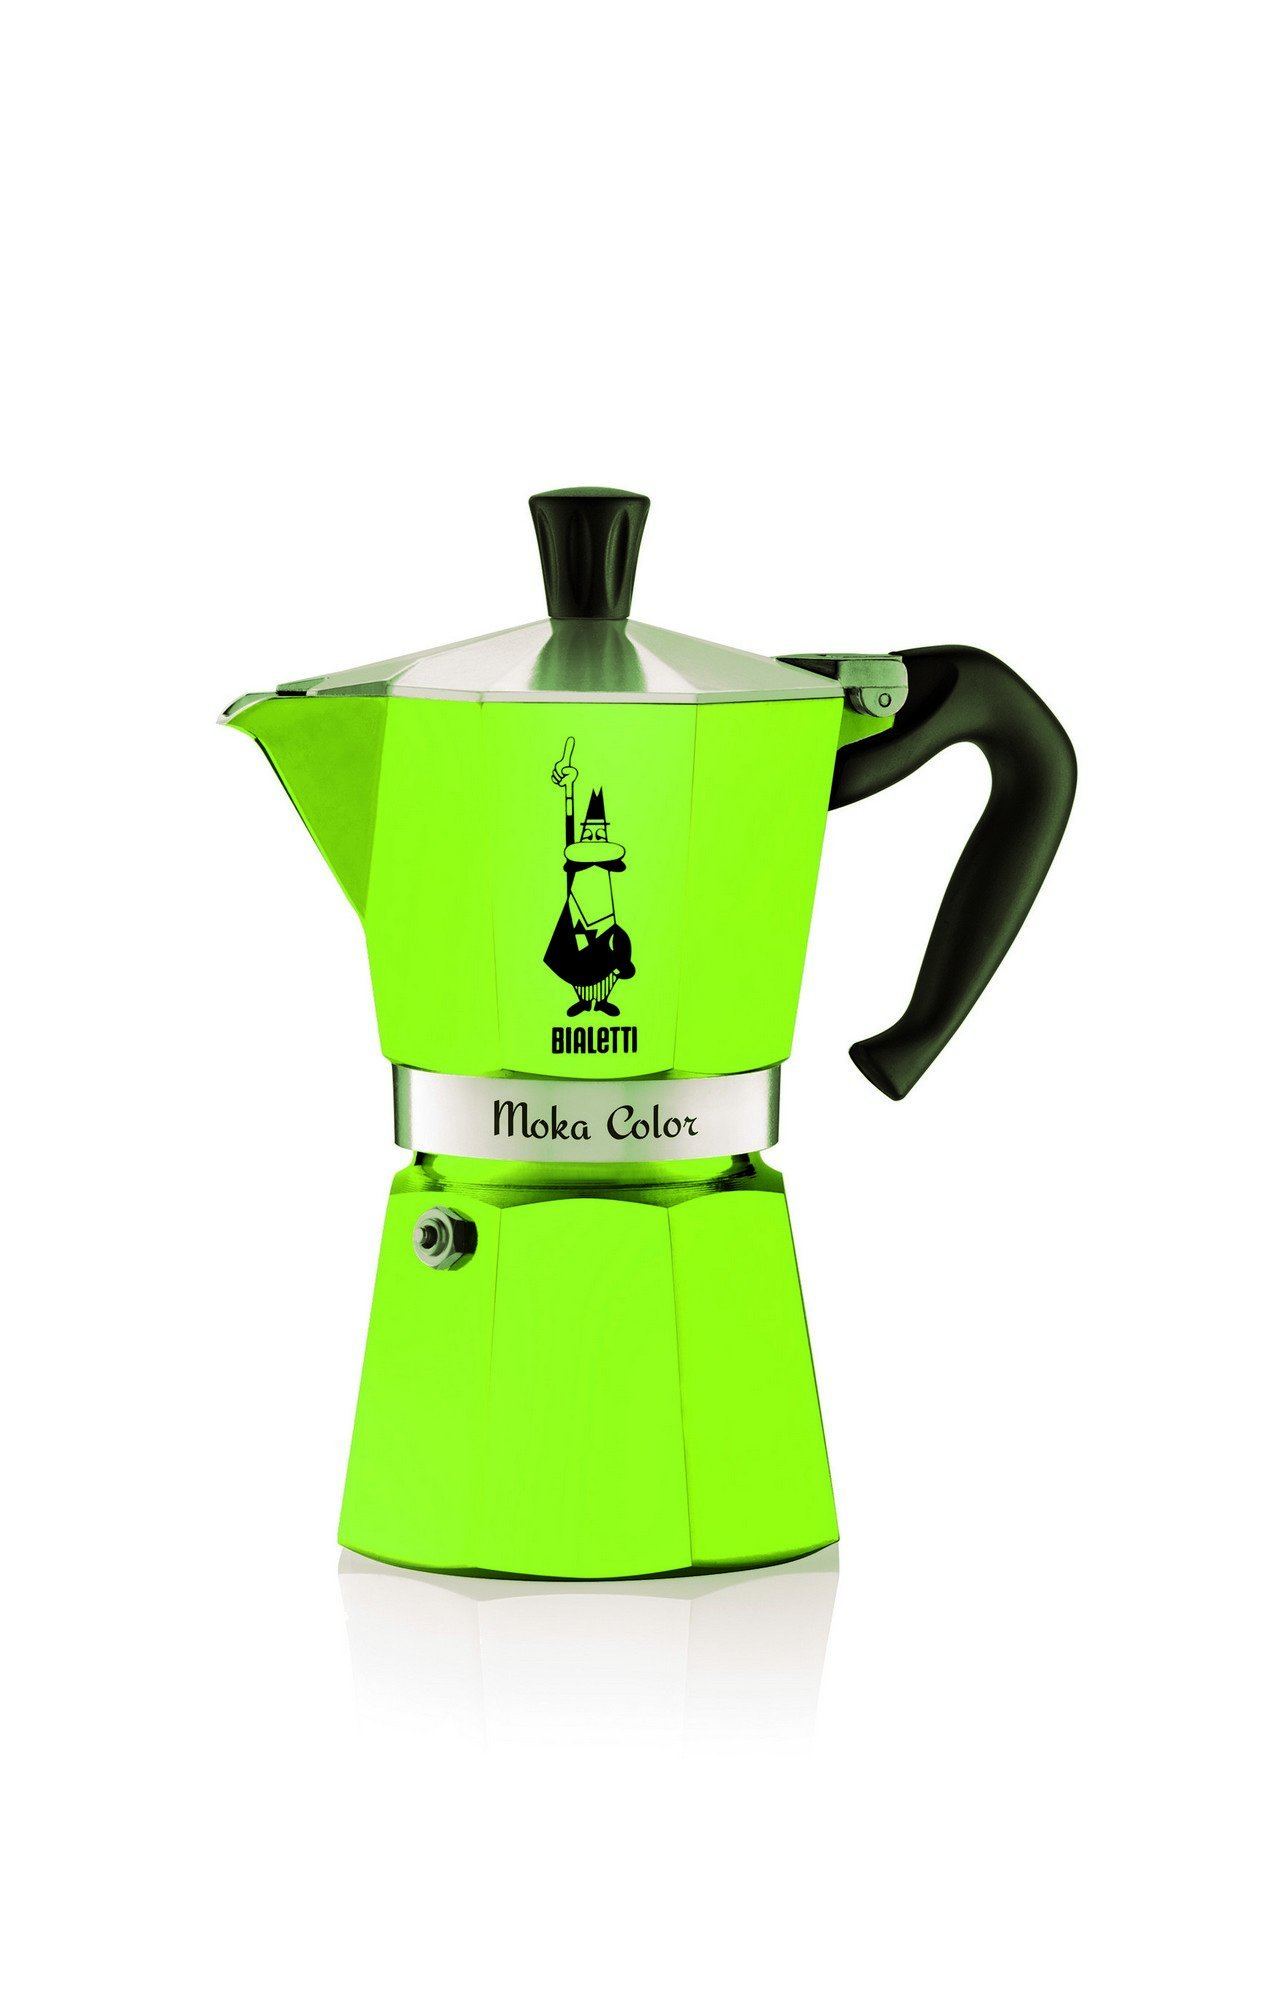 Bialetti Moka Express Color 0.3L Verde - cafeteras italianas (Aluminio, Verde, Moka Color): Amazon.es: Hogar